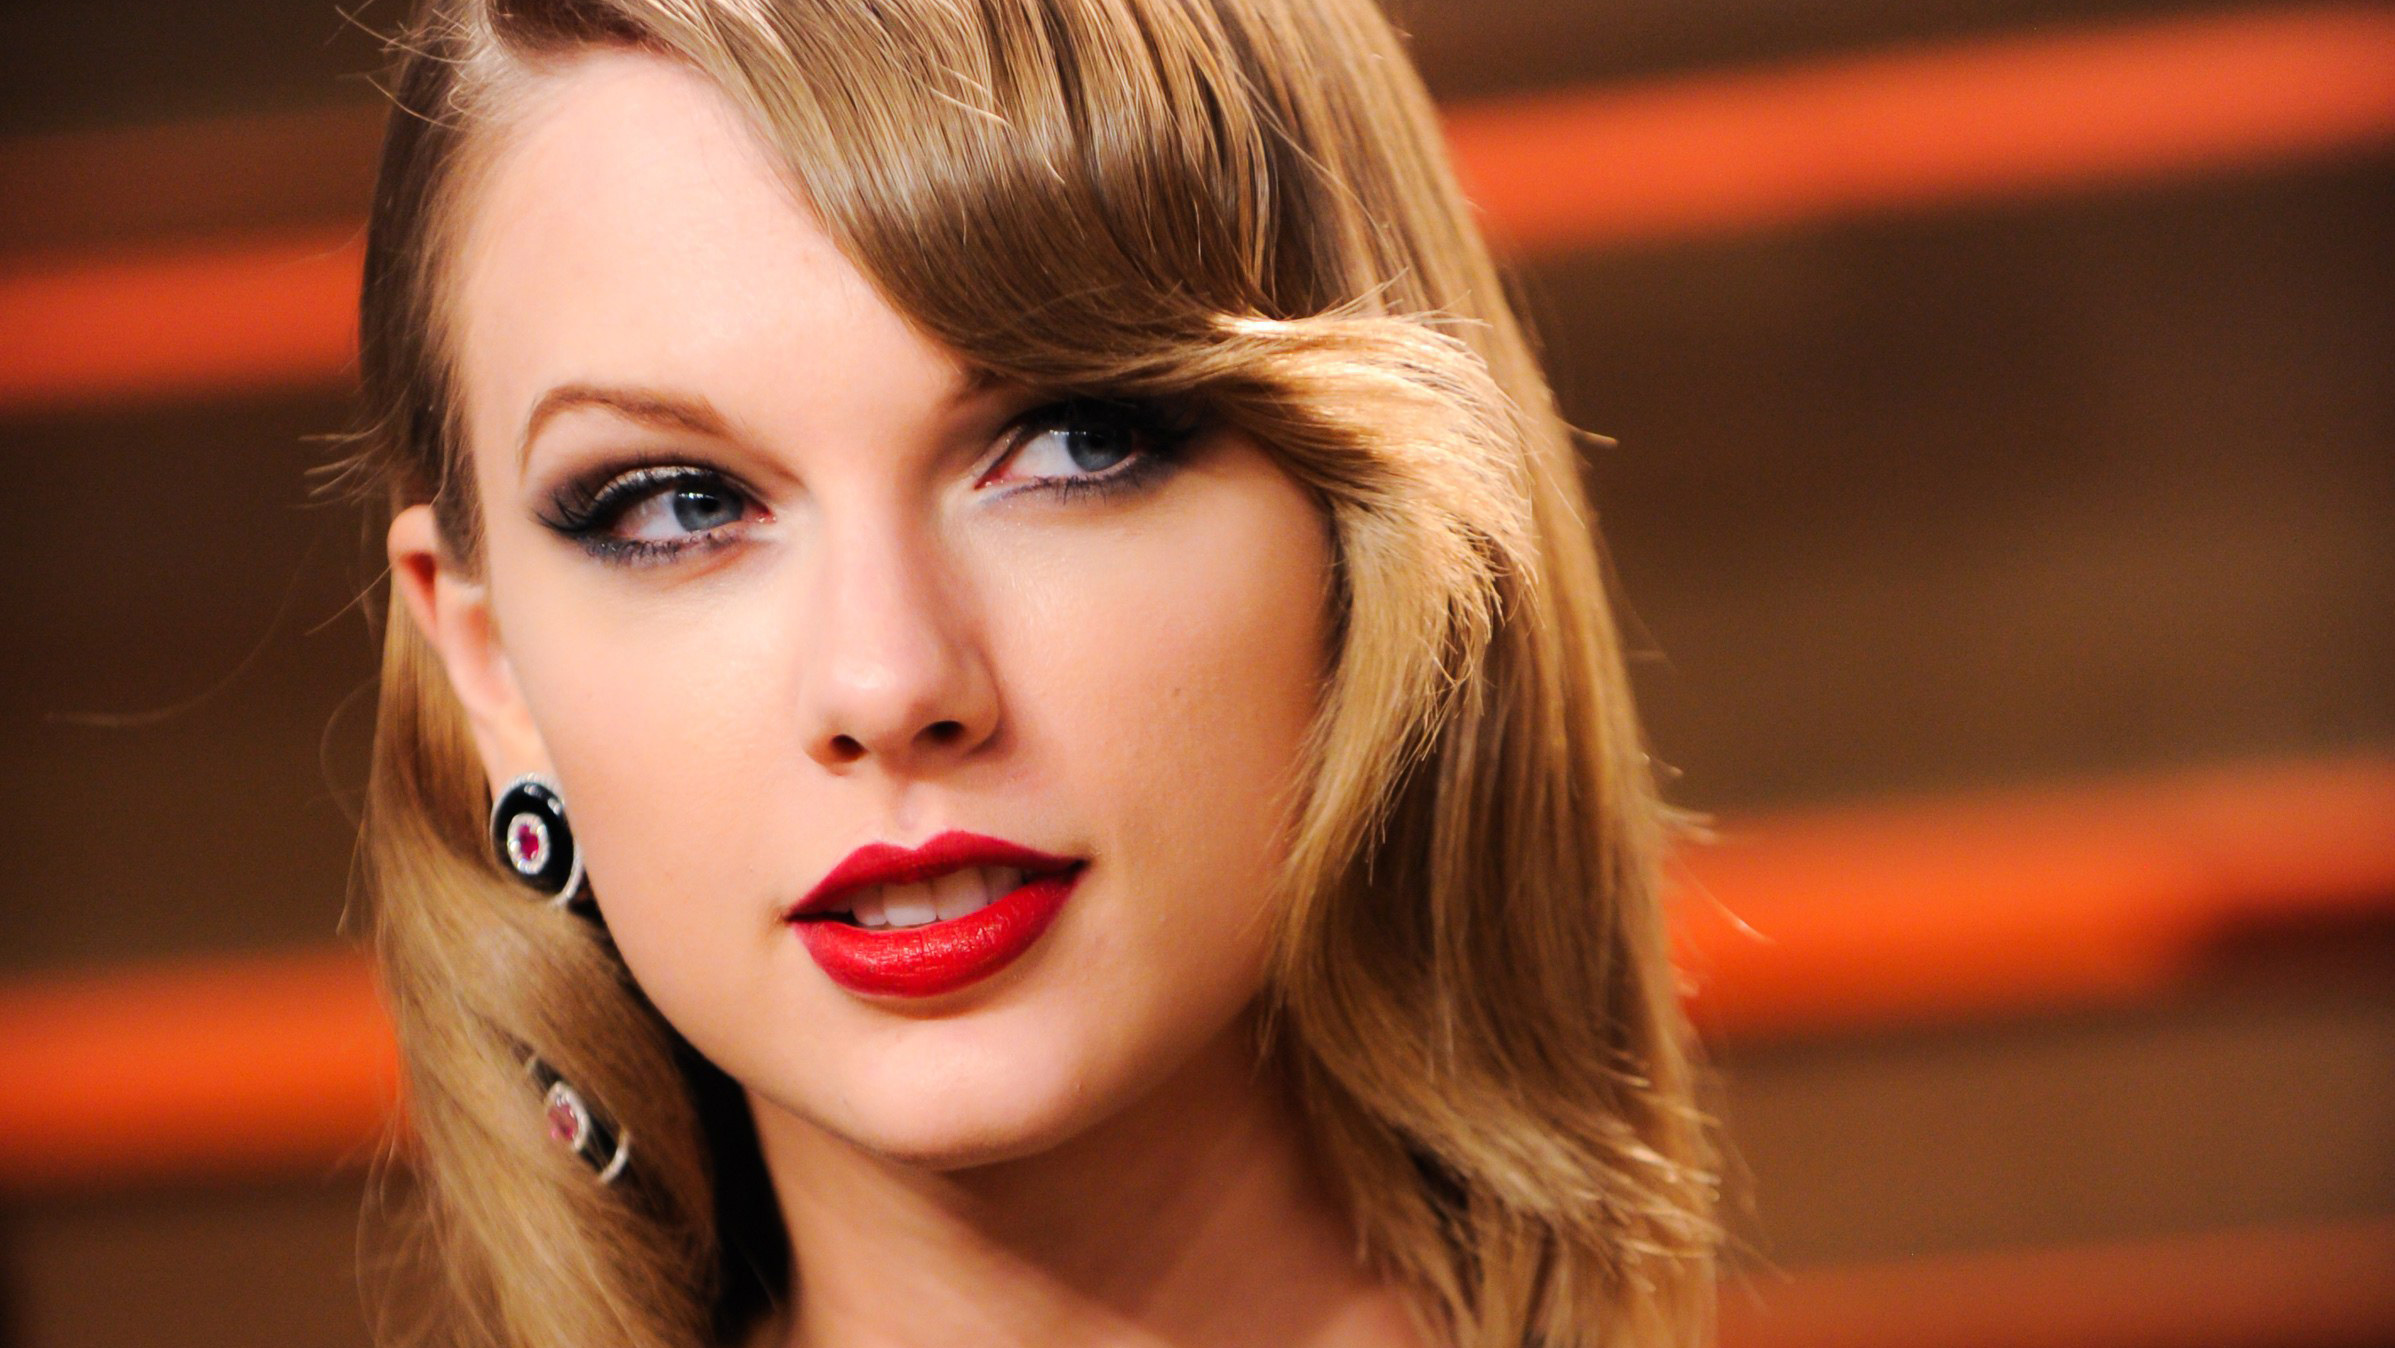 Fondos de pantalla Taylor Swift 2020